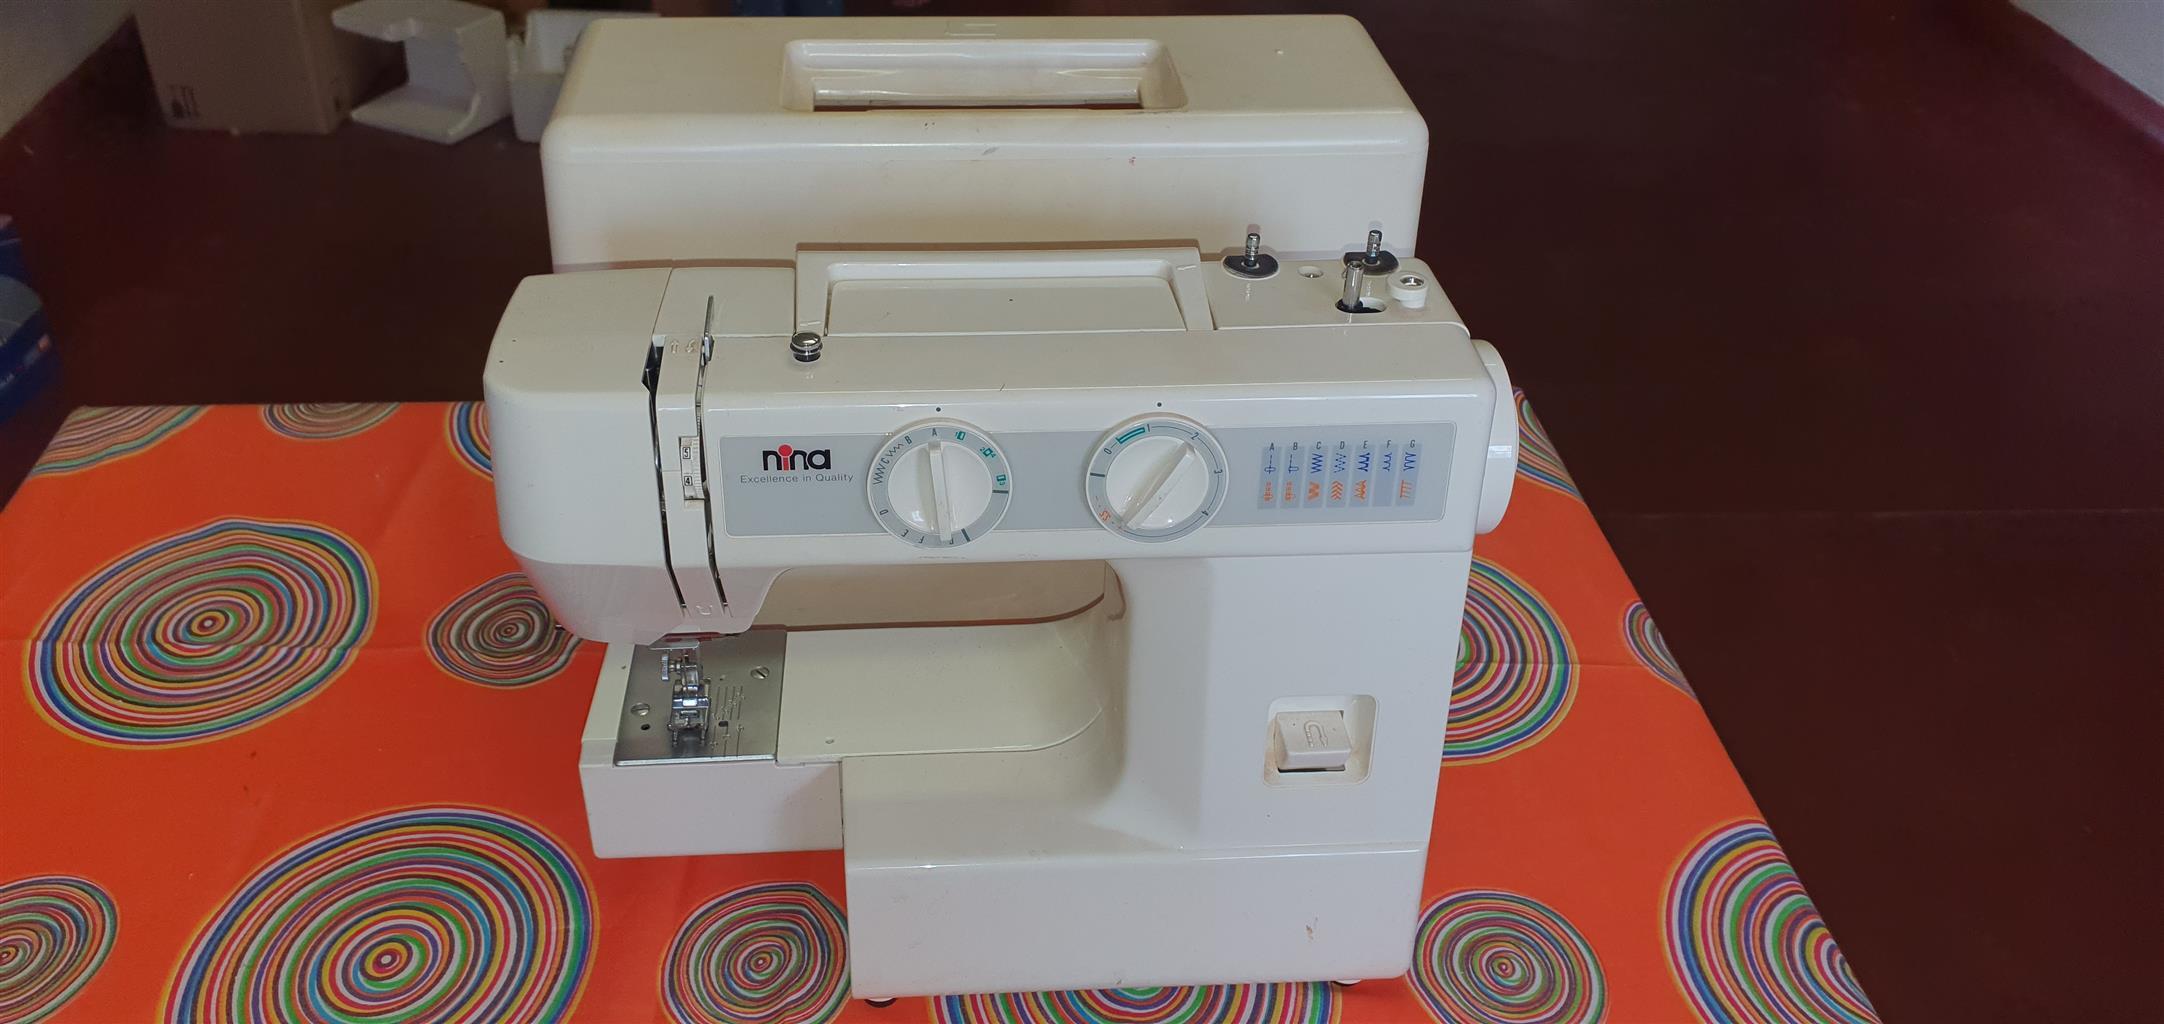 Nina Sewing Machine